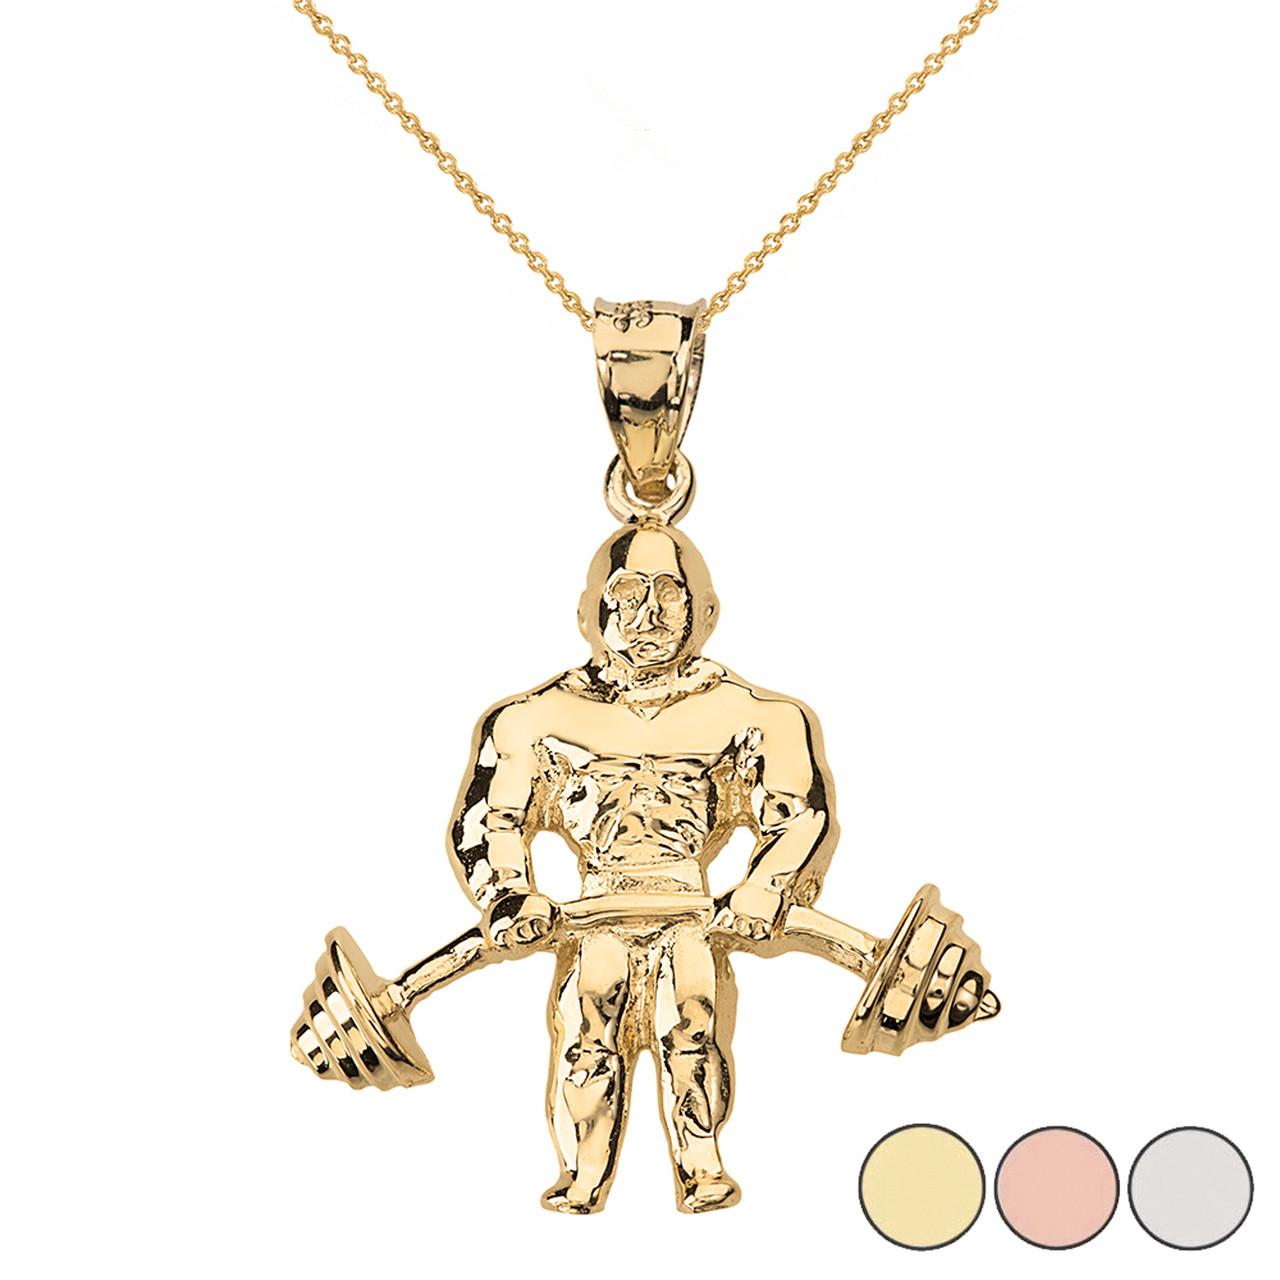 10k Rose Gold Full Bodybuilder Sports Pendant Necklace